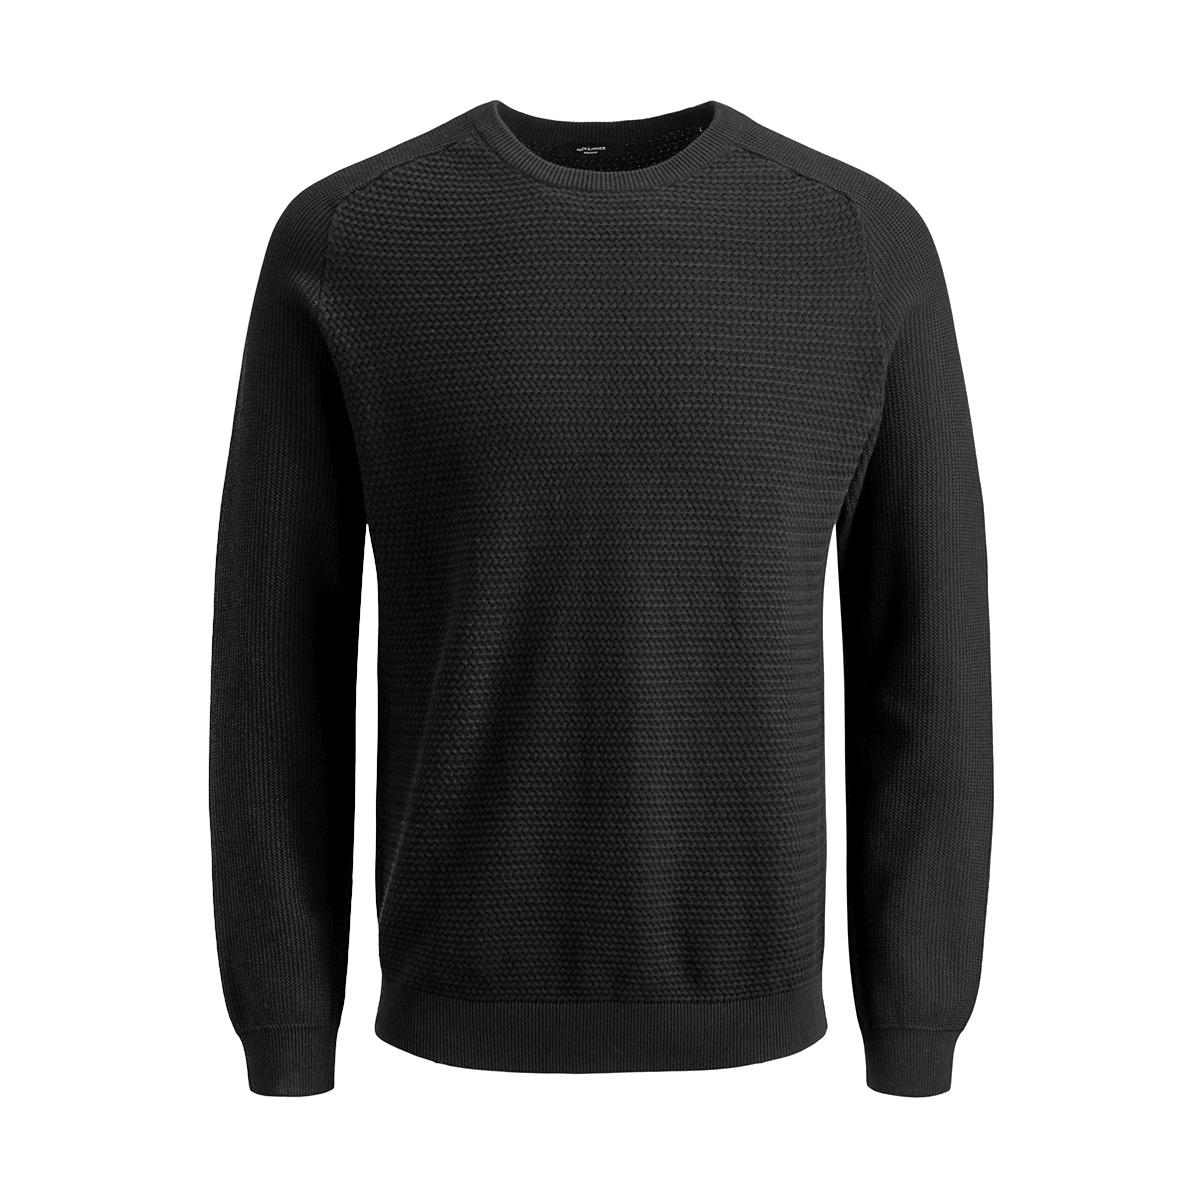 jprpost knit crew neck sts 12141495 jack & jones trui black